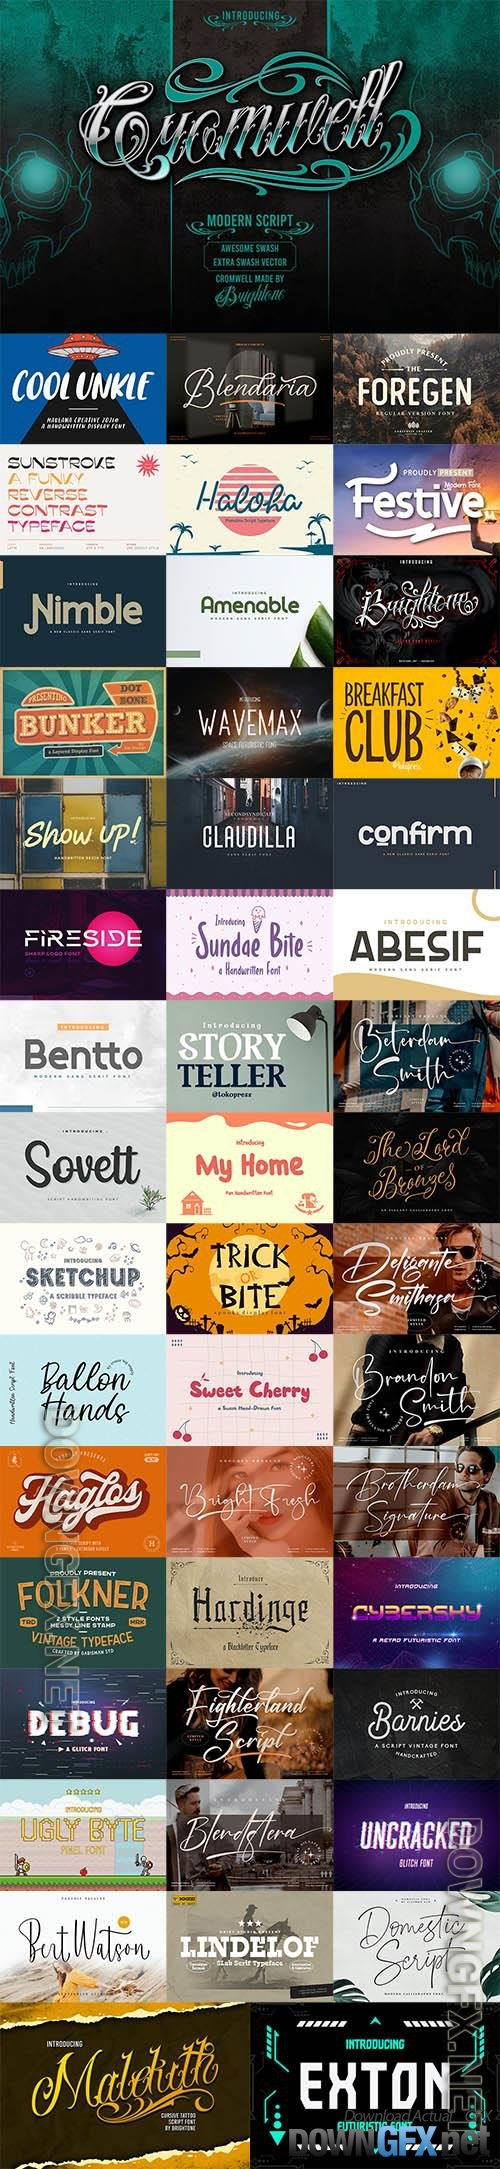 48 Awesome Fonts Bundle 11 (OTF, TTF, WOFF)